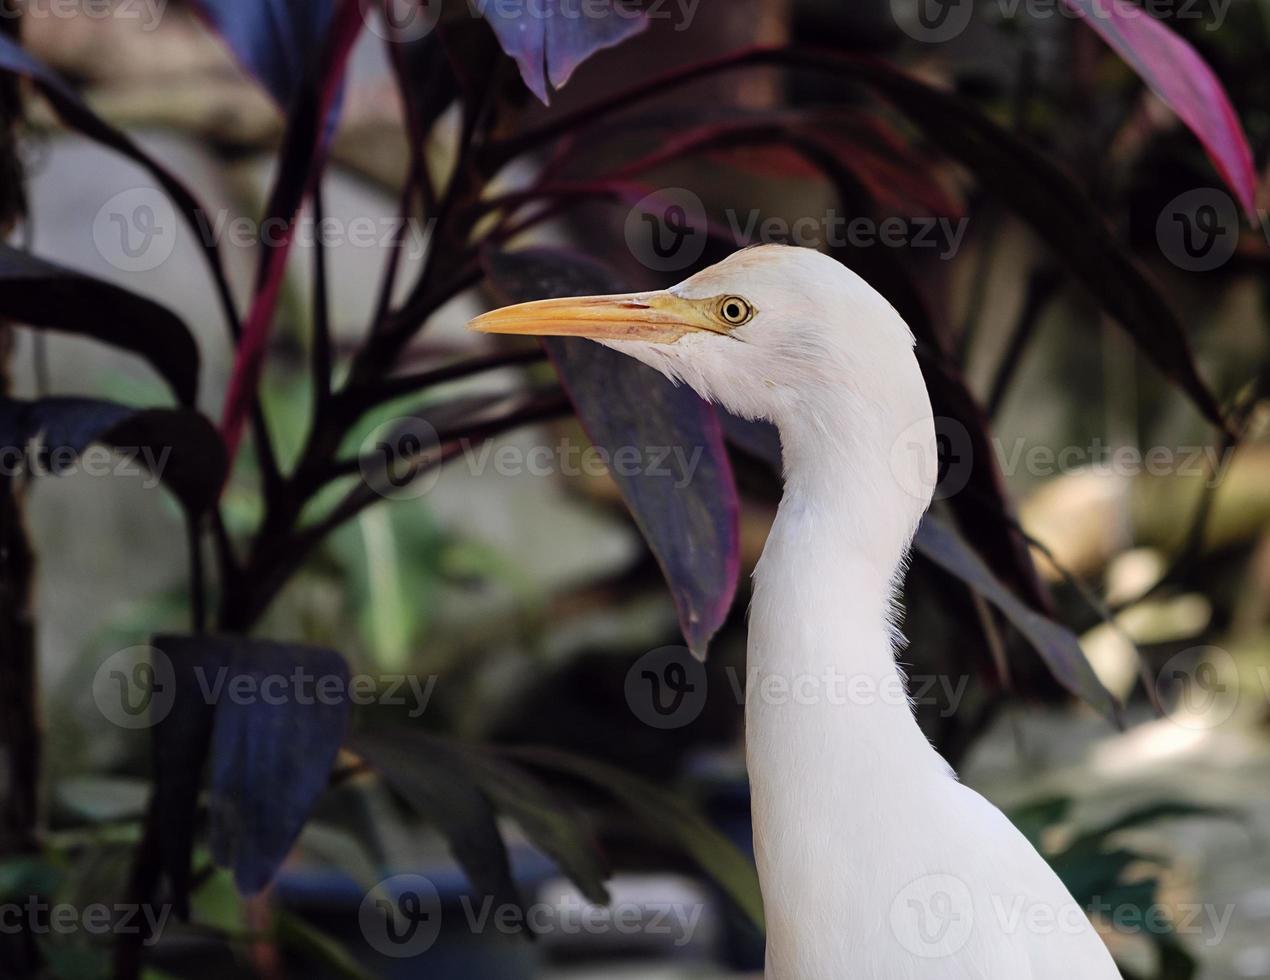 Great white egret in nature, closeup photo